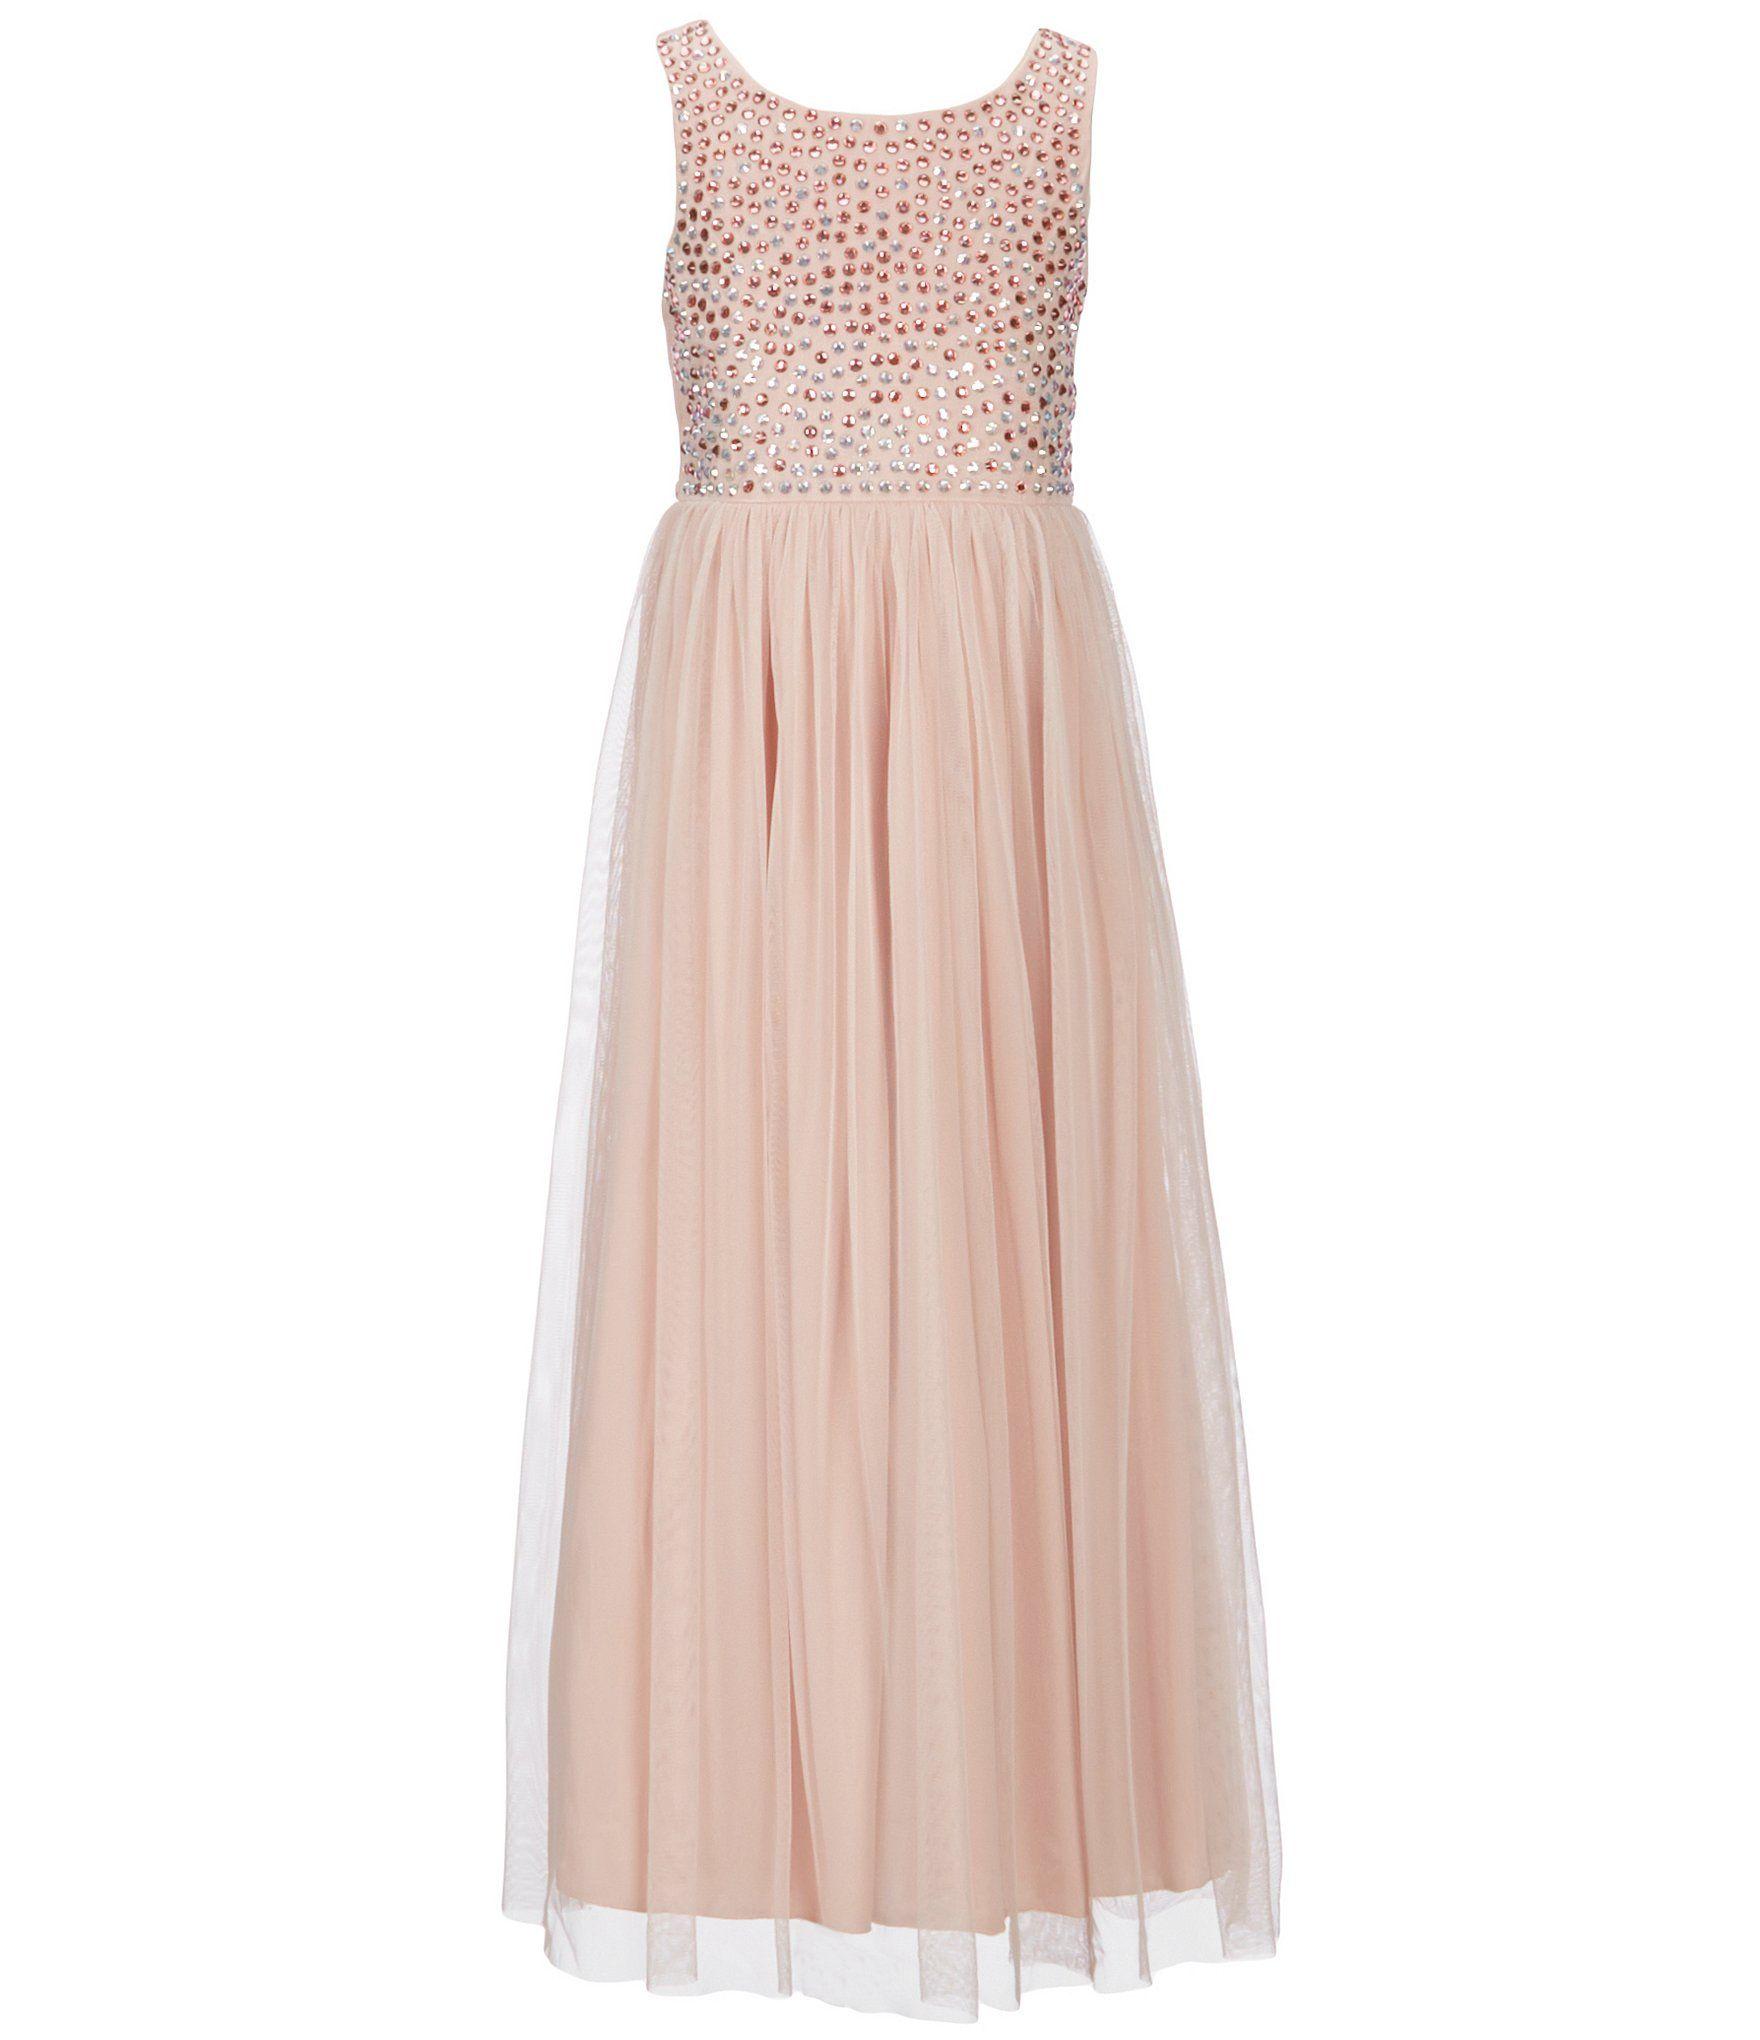 65409f822 Sequin Hearts 2-Pc. Lace Charmeuse Maxi Dress Set, Big Girls (7-16) &  Reviews - Dresses - Kids - Macy's